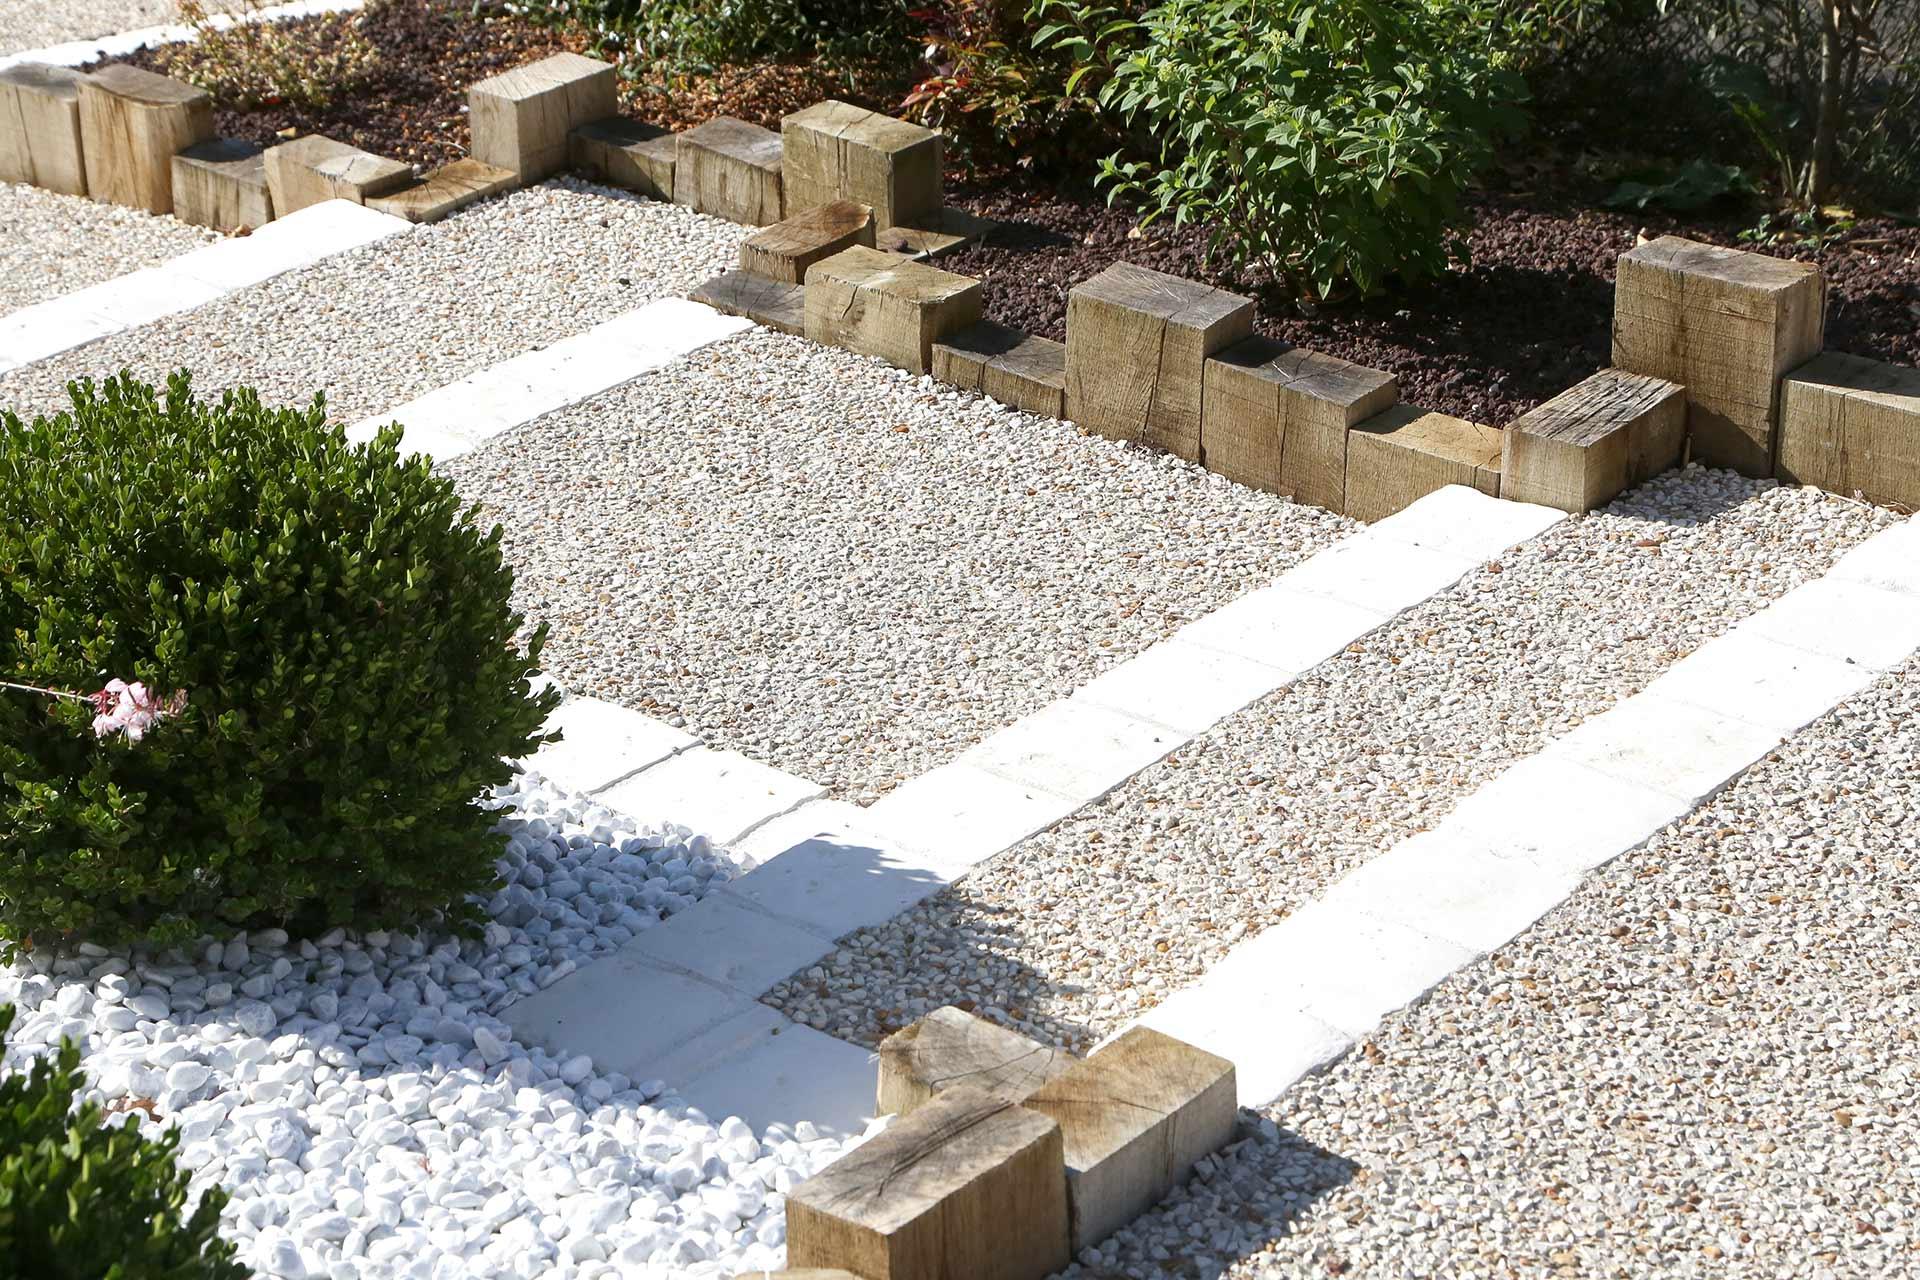 Allée De Garage En Béton Drainant béton désactivé - serrault jardins